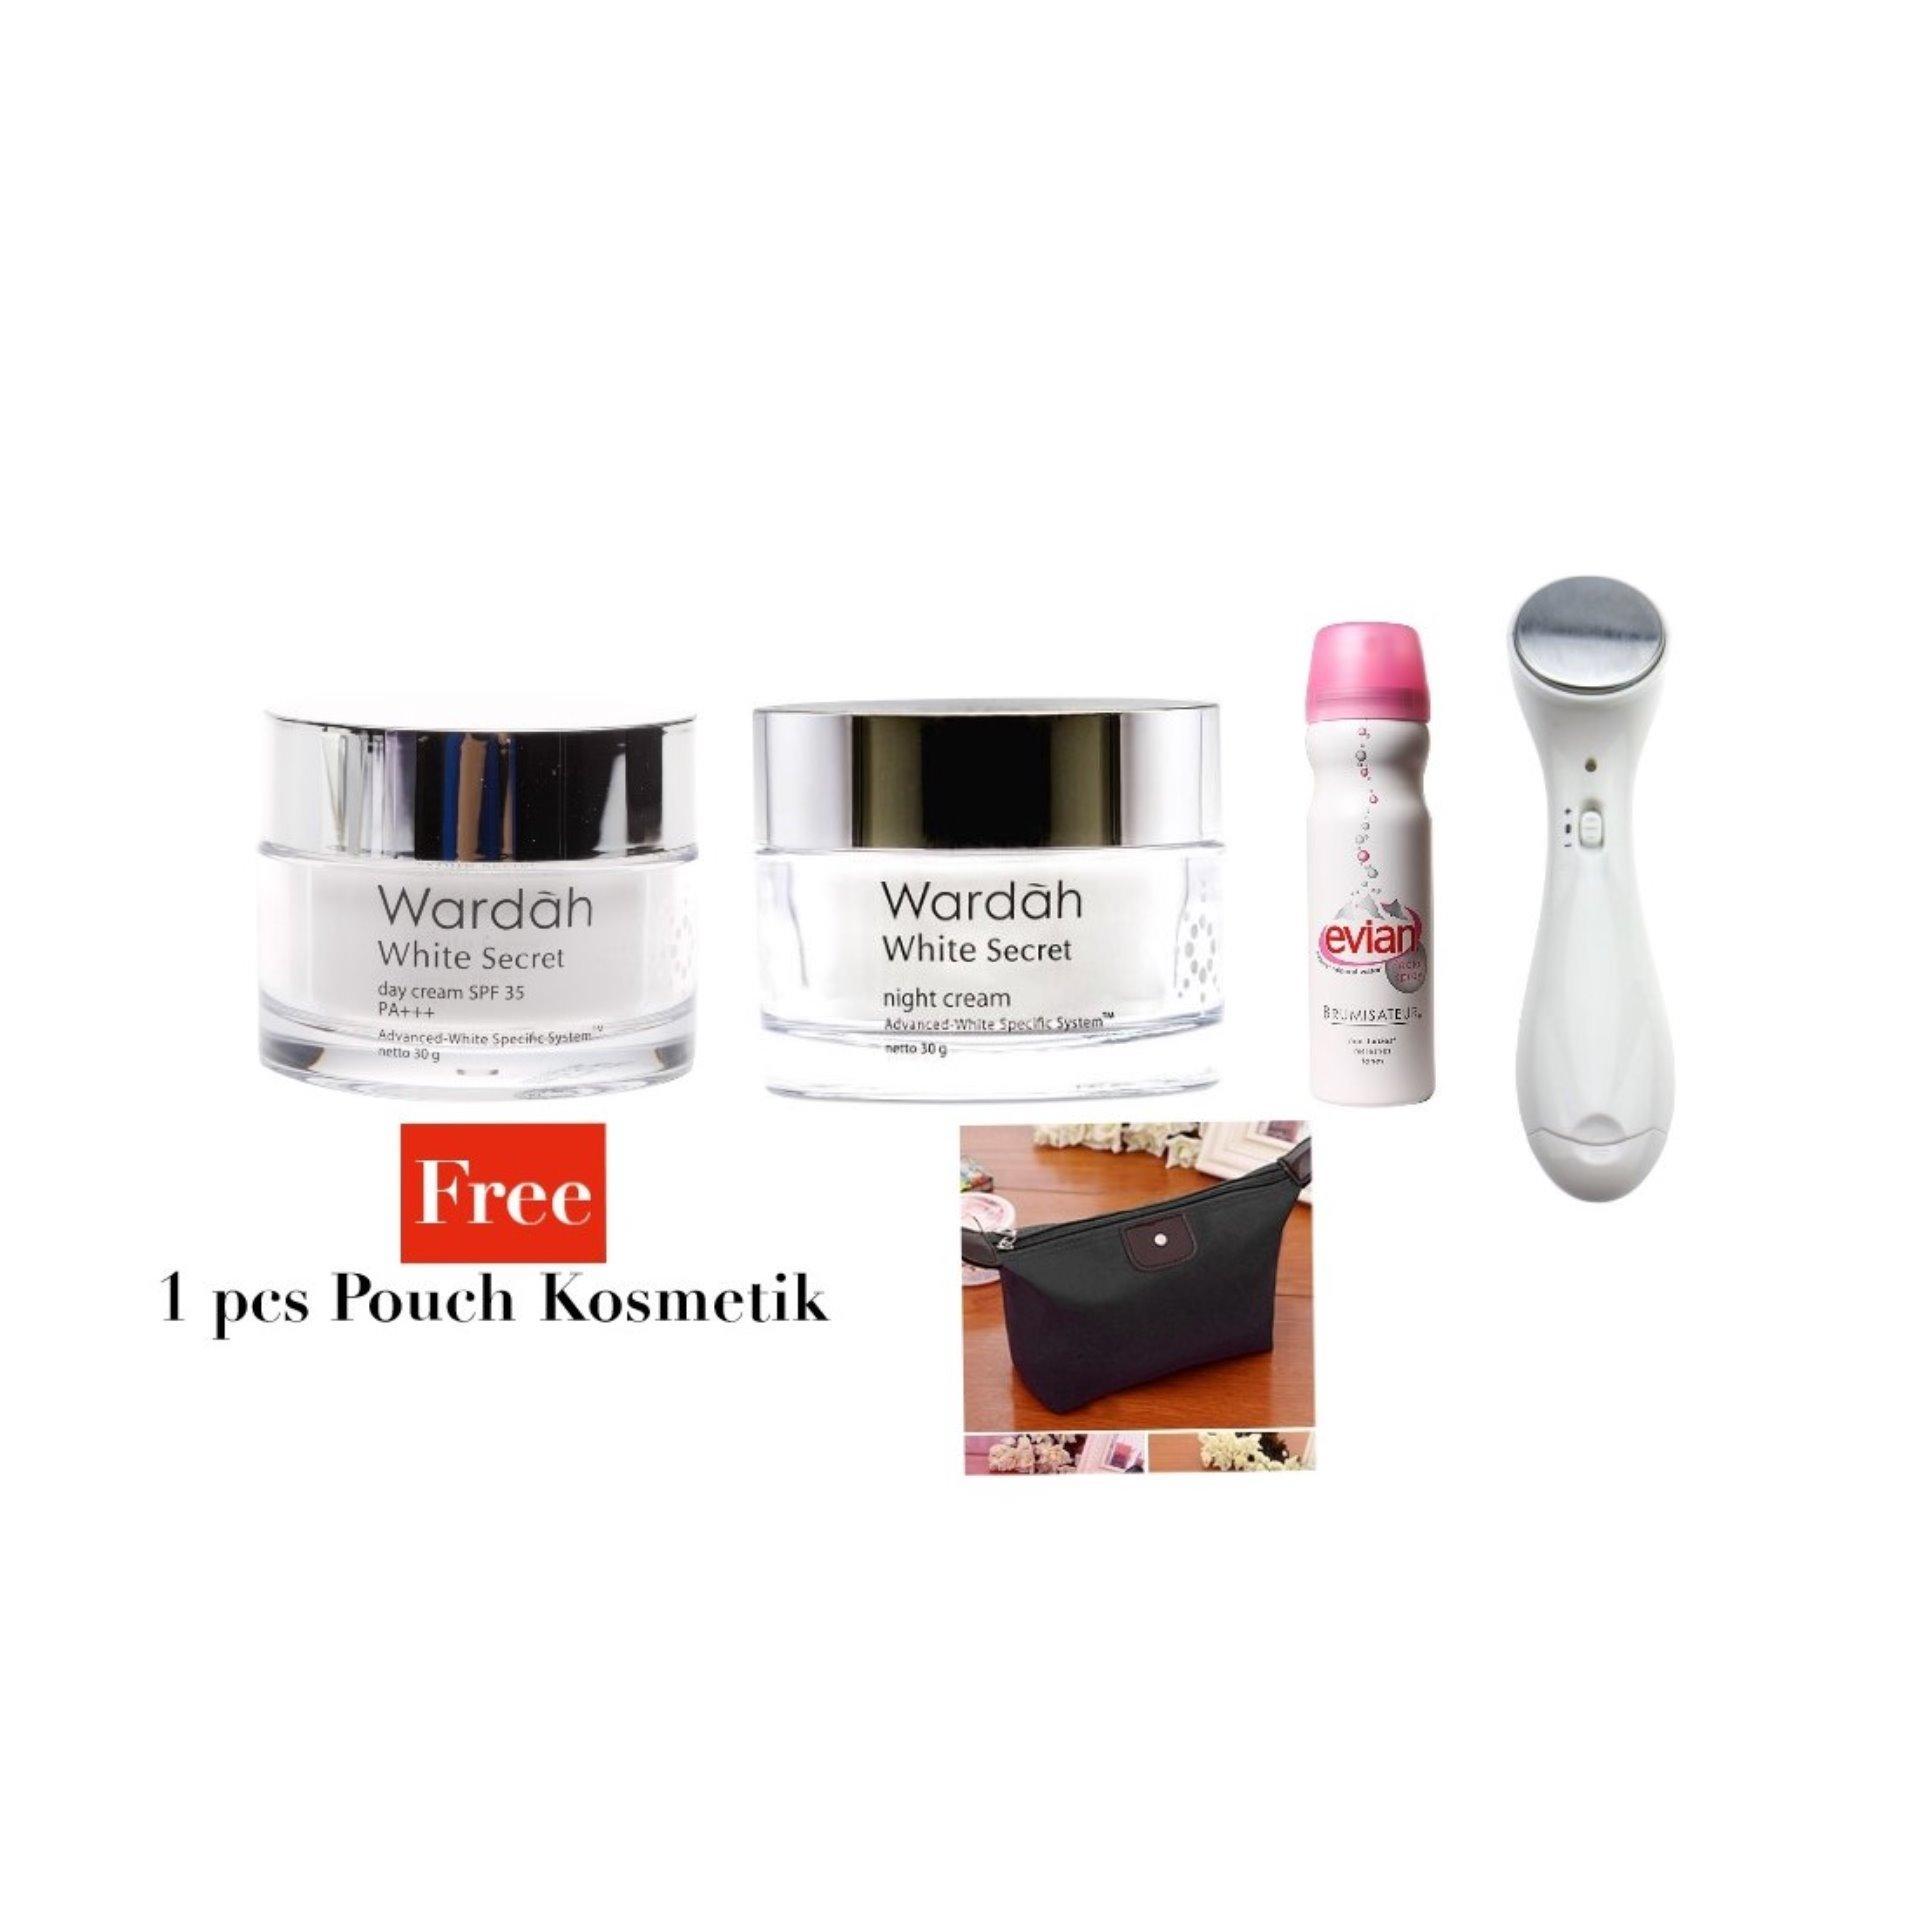 Penawaran Evian Facial Spray 300 Ml 300ml Wardah White Secret Ion Massager Skincare Perawatan Free Pouch